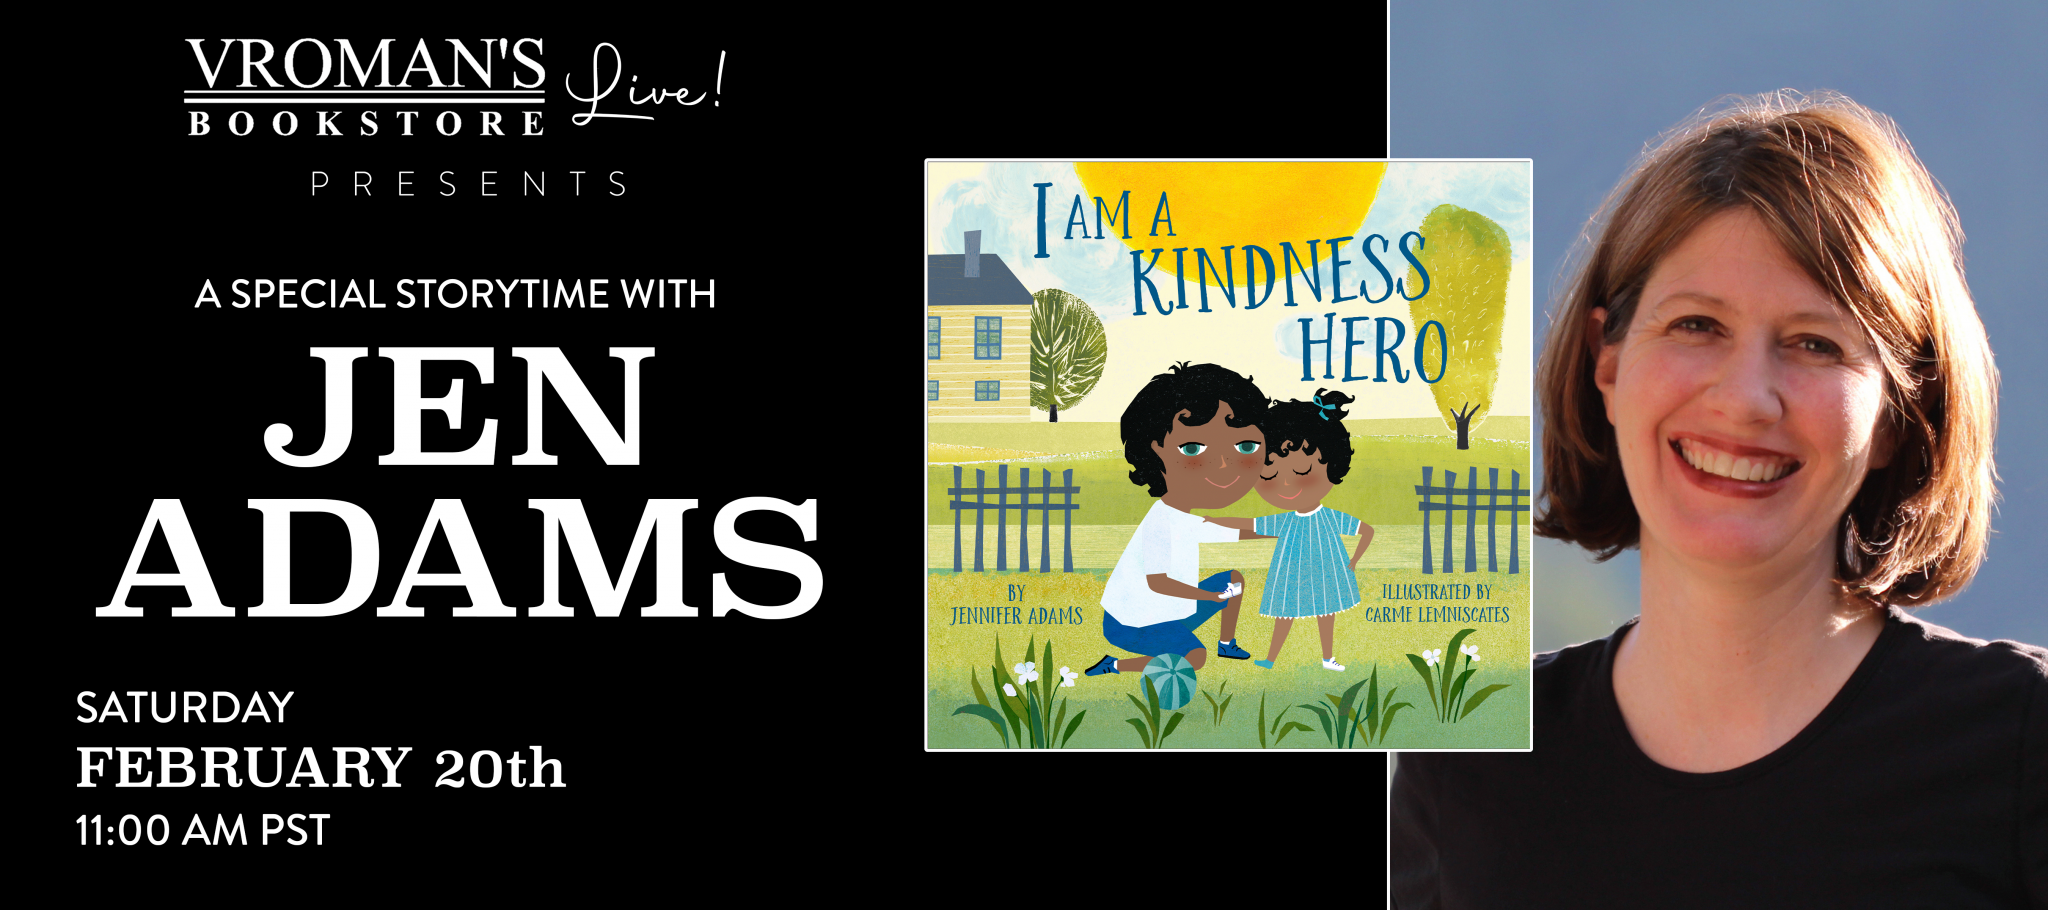 Vroman's Story Time 'I am a Kindness Hero (I am a Warrior Goddess)'